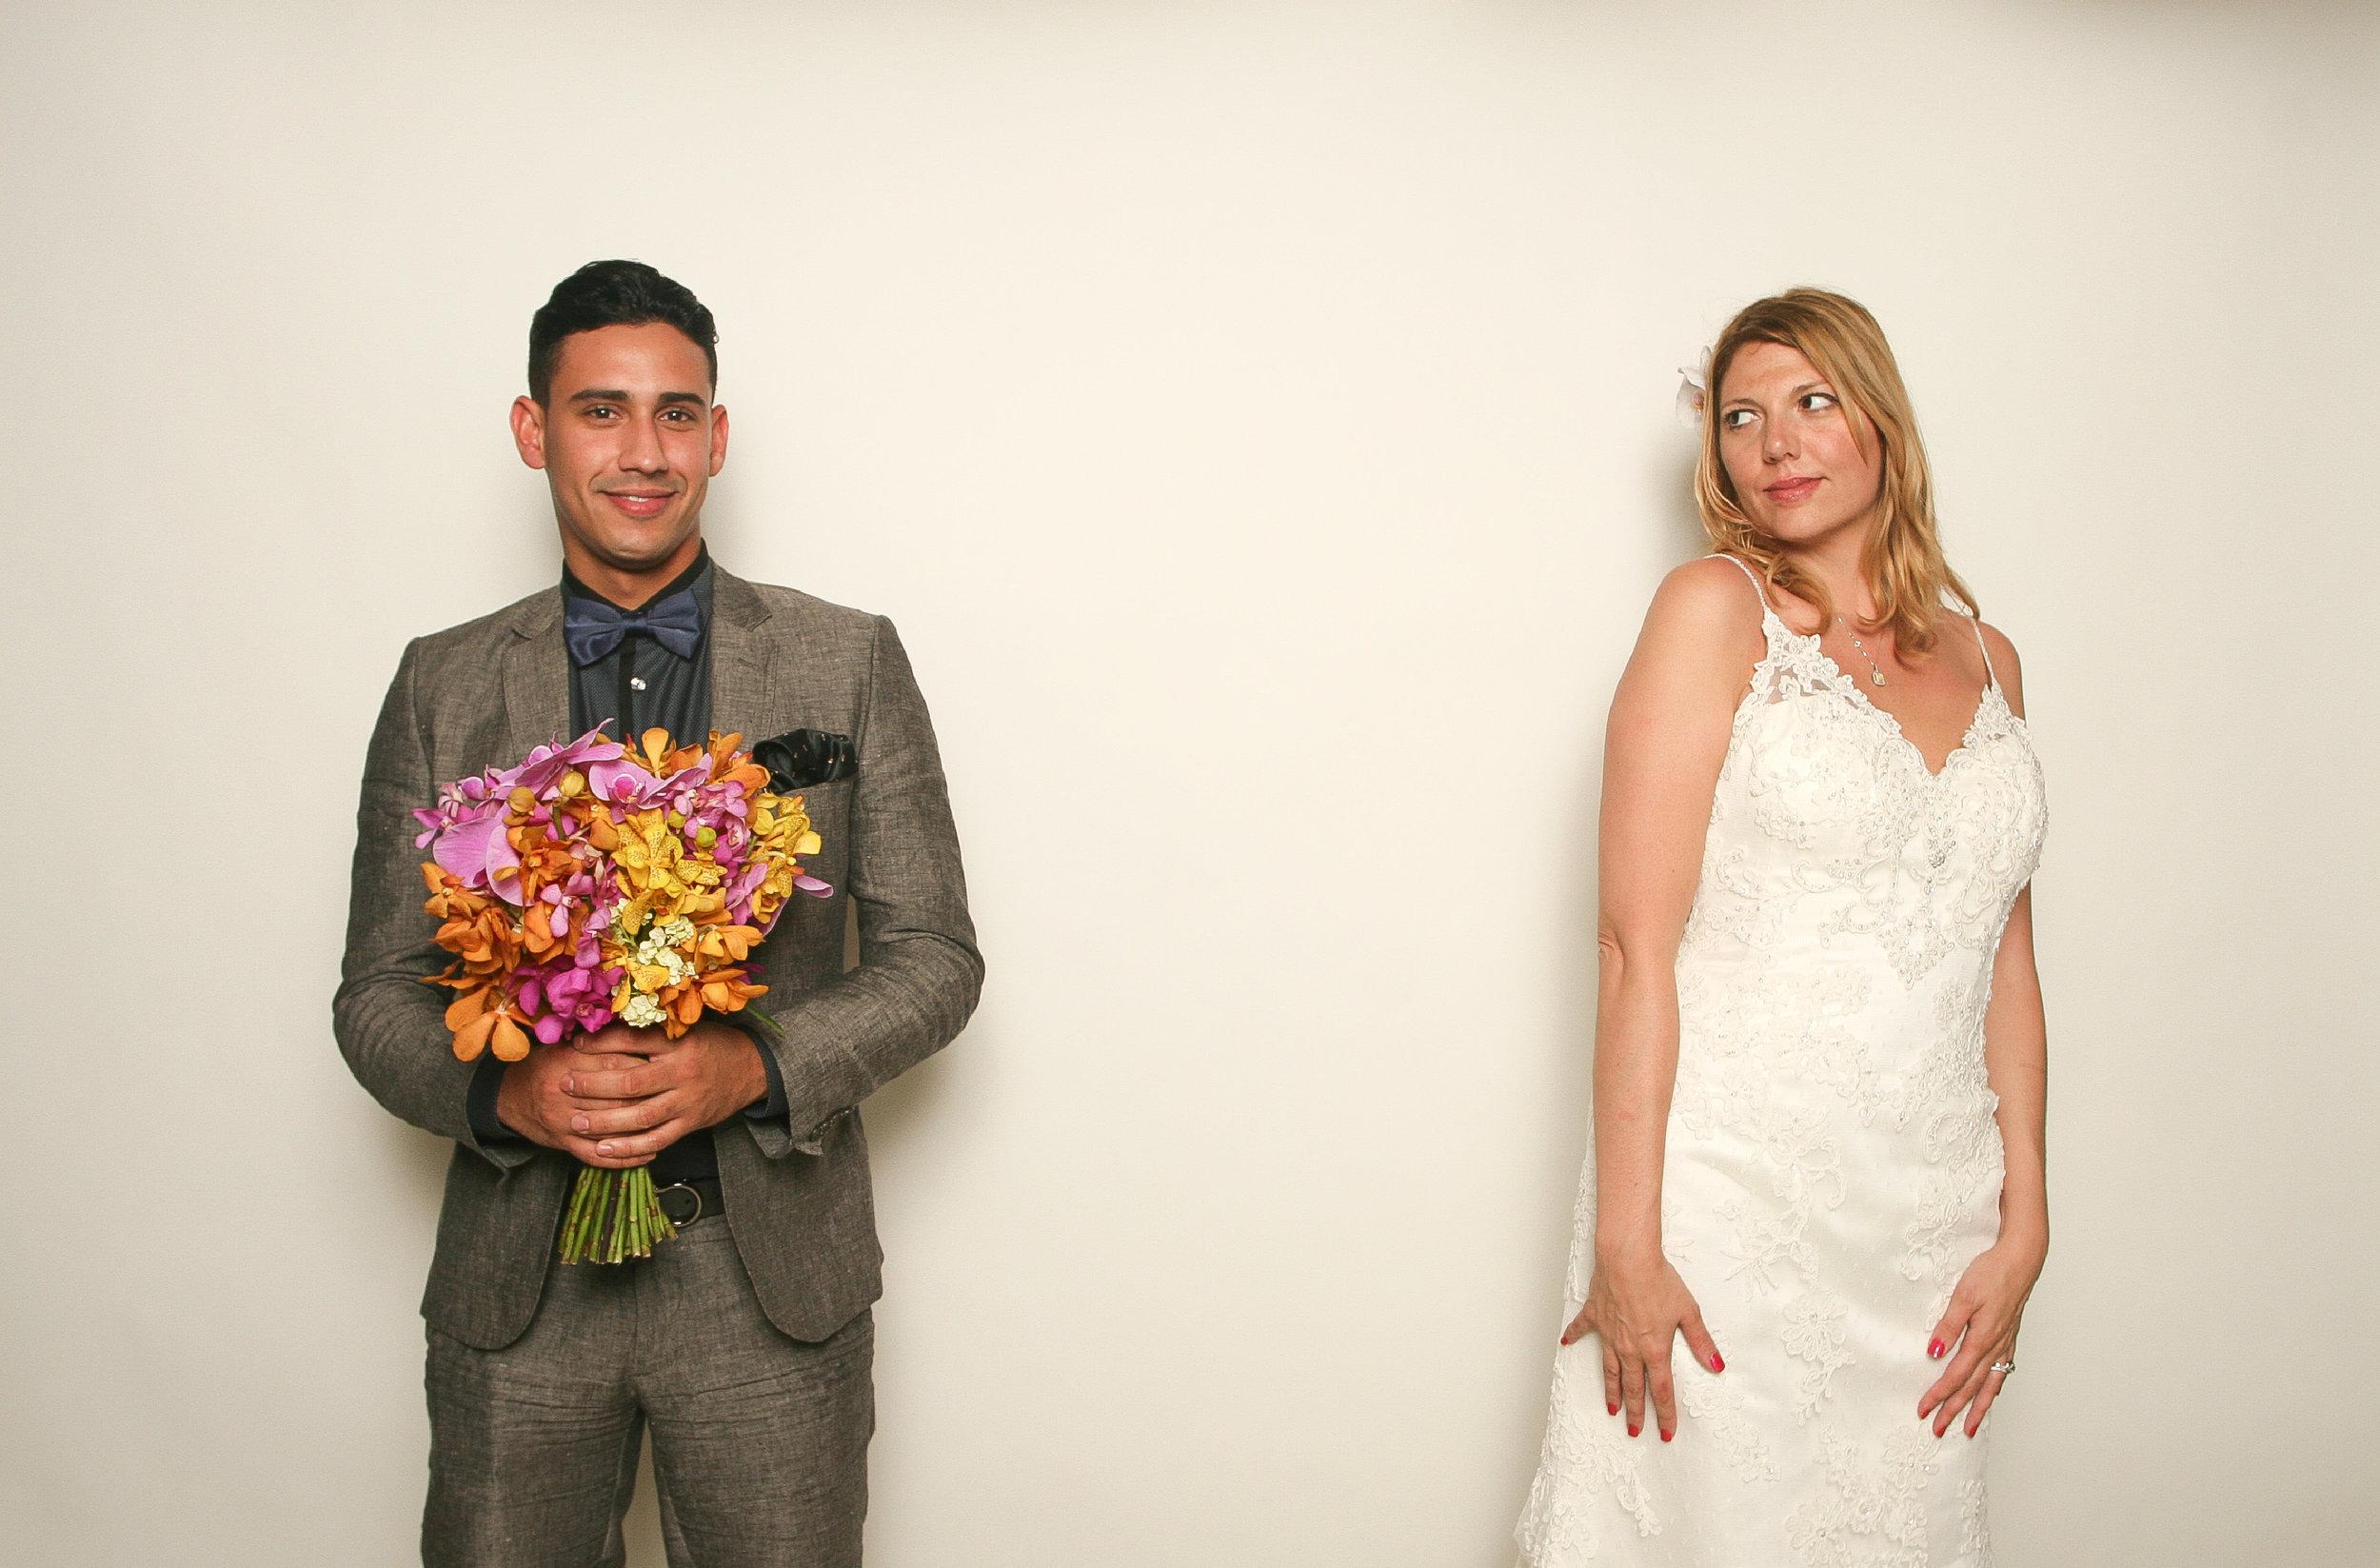 South Florida Miami Wedding Photobooth26.jpg